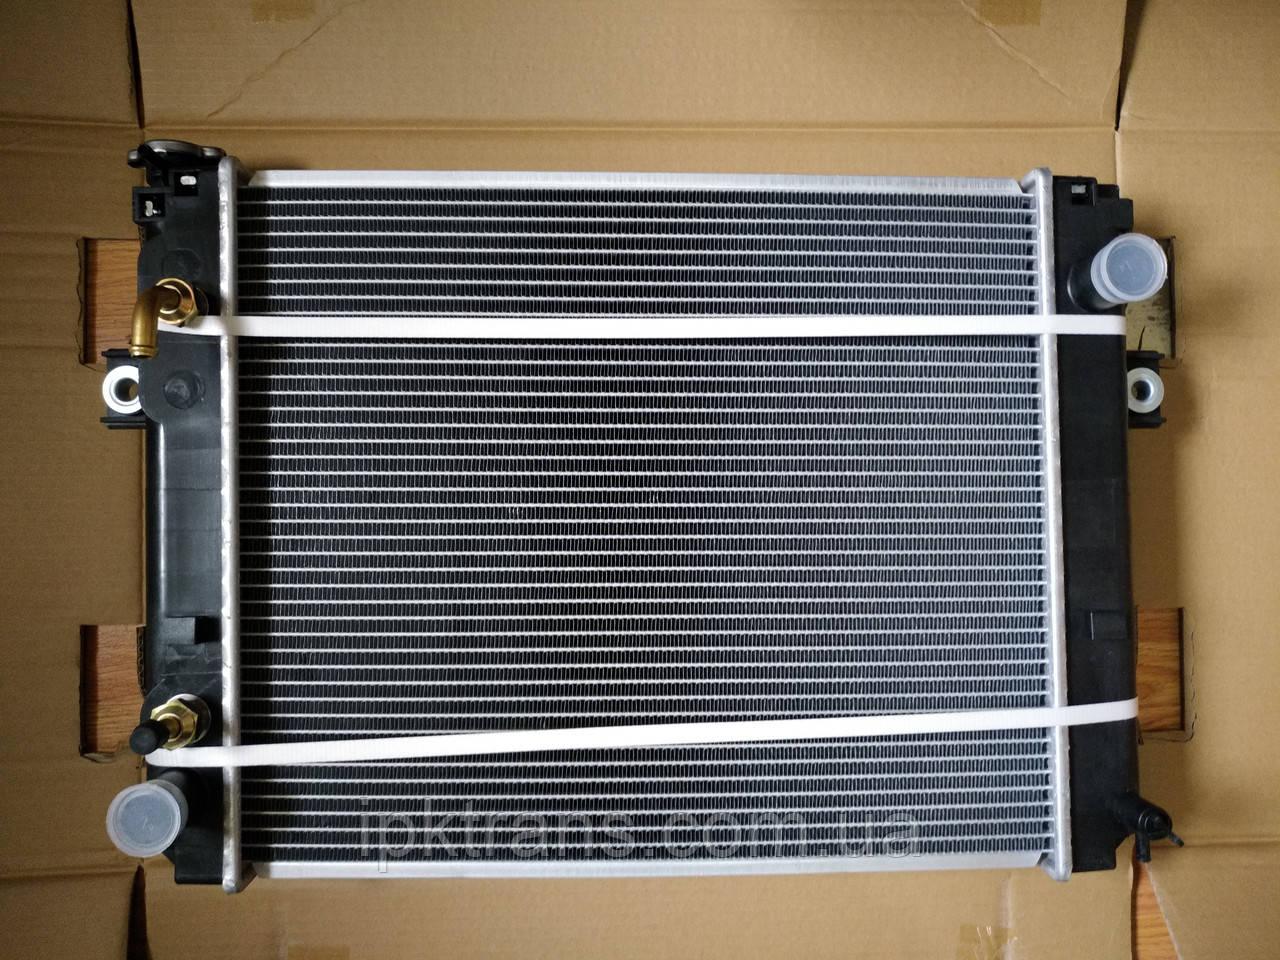 Радиатор водяной погрузчика TCM FG20-30T6 Nissan H20  236L2-10101, 236L210101